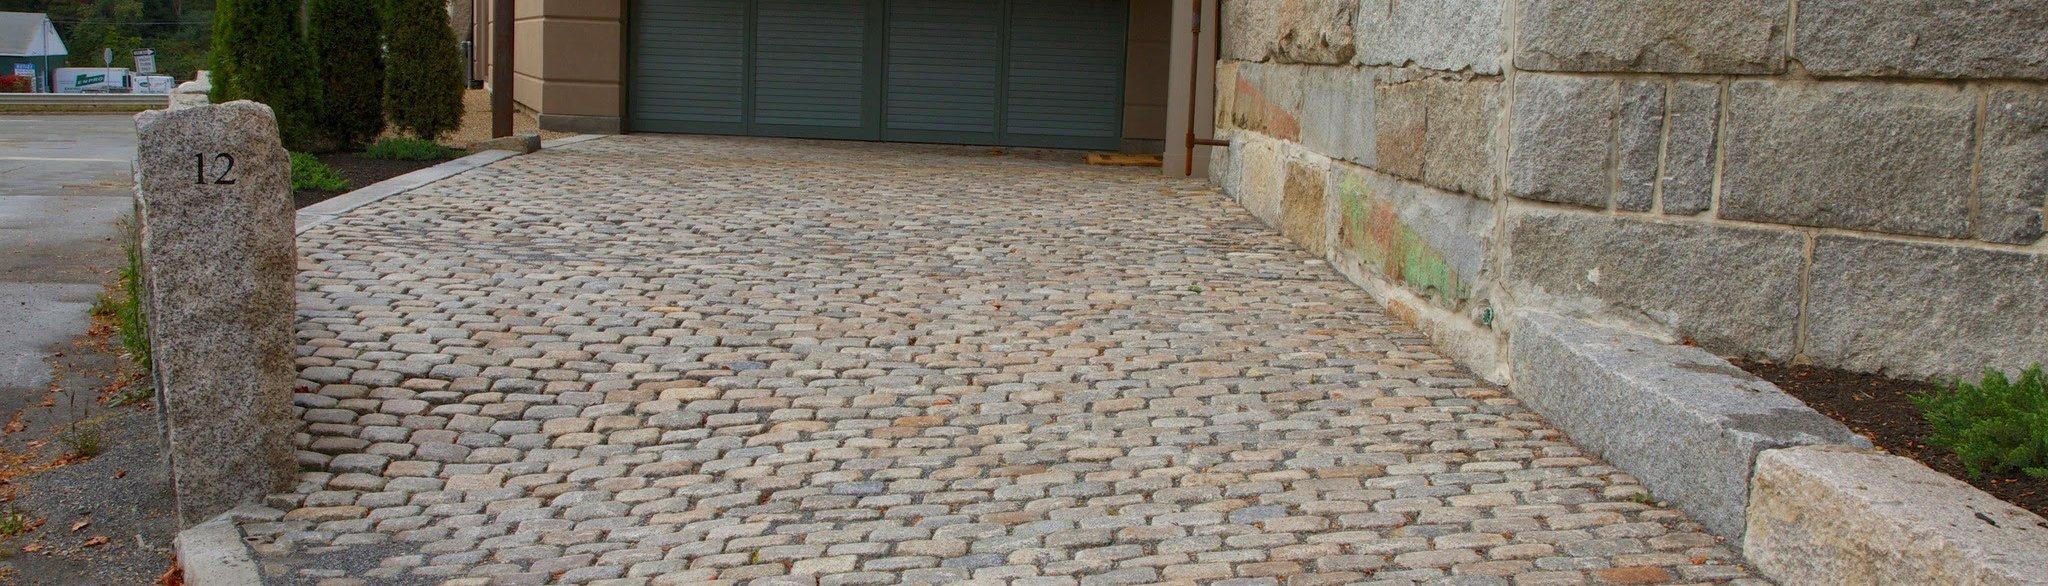 New England reclaimed cobblestone driveway